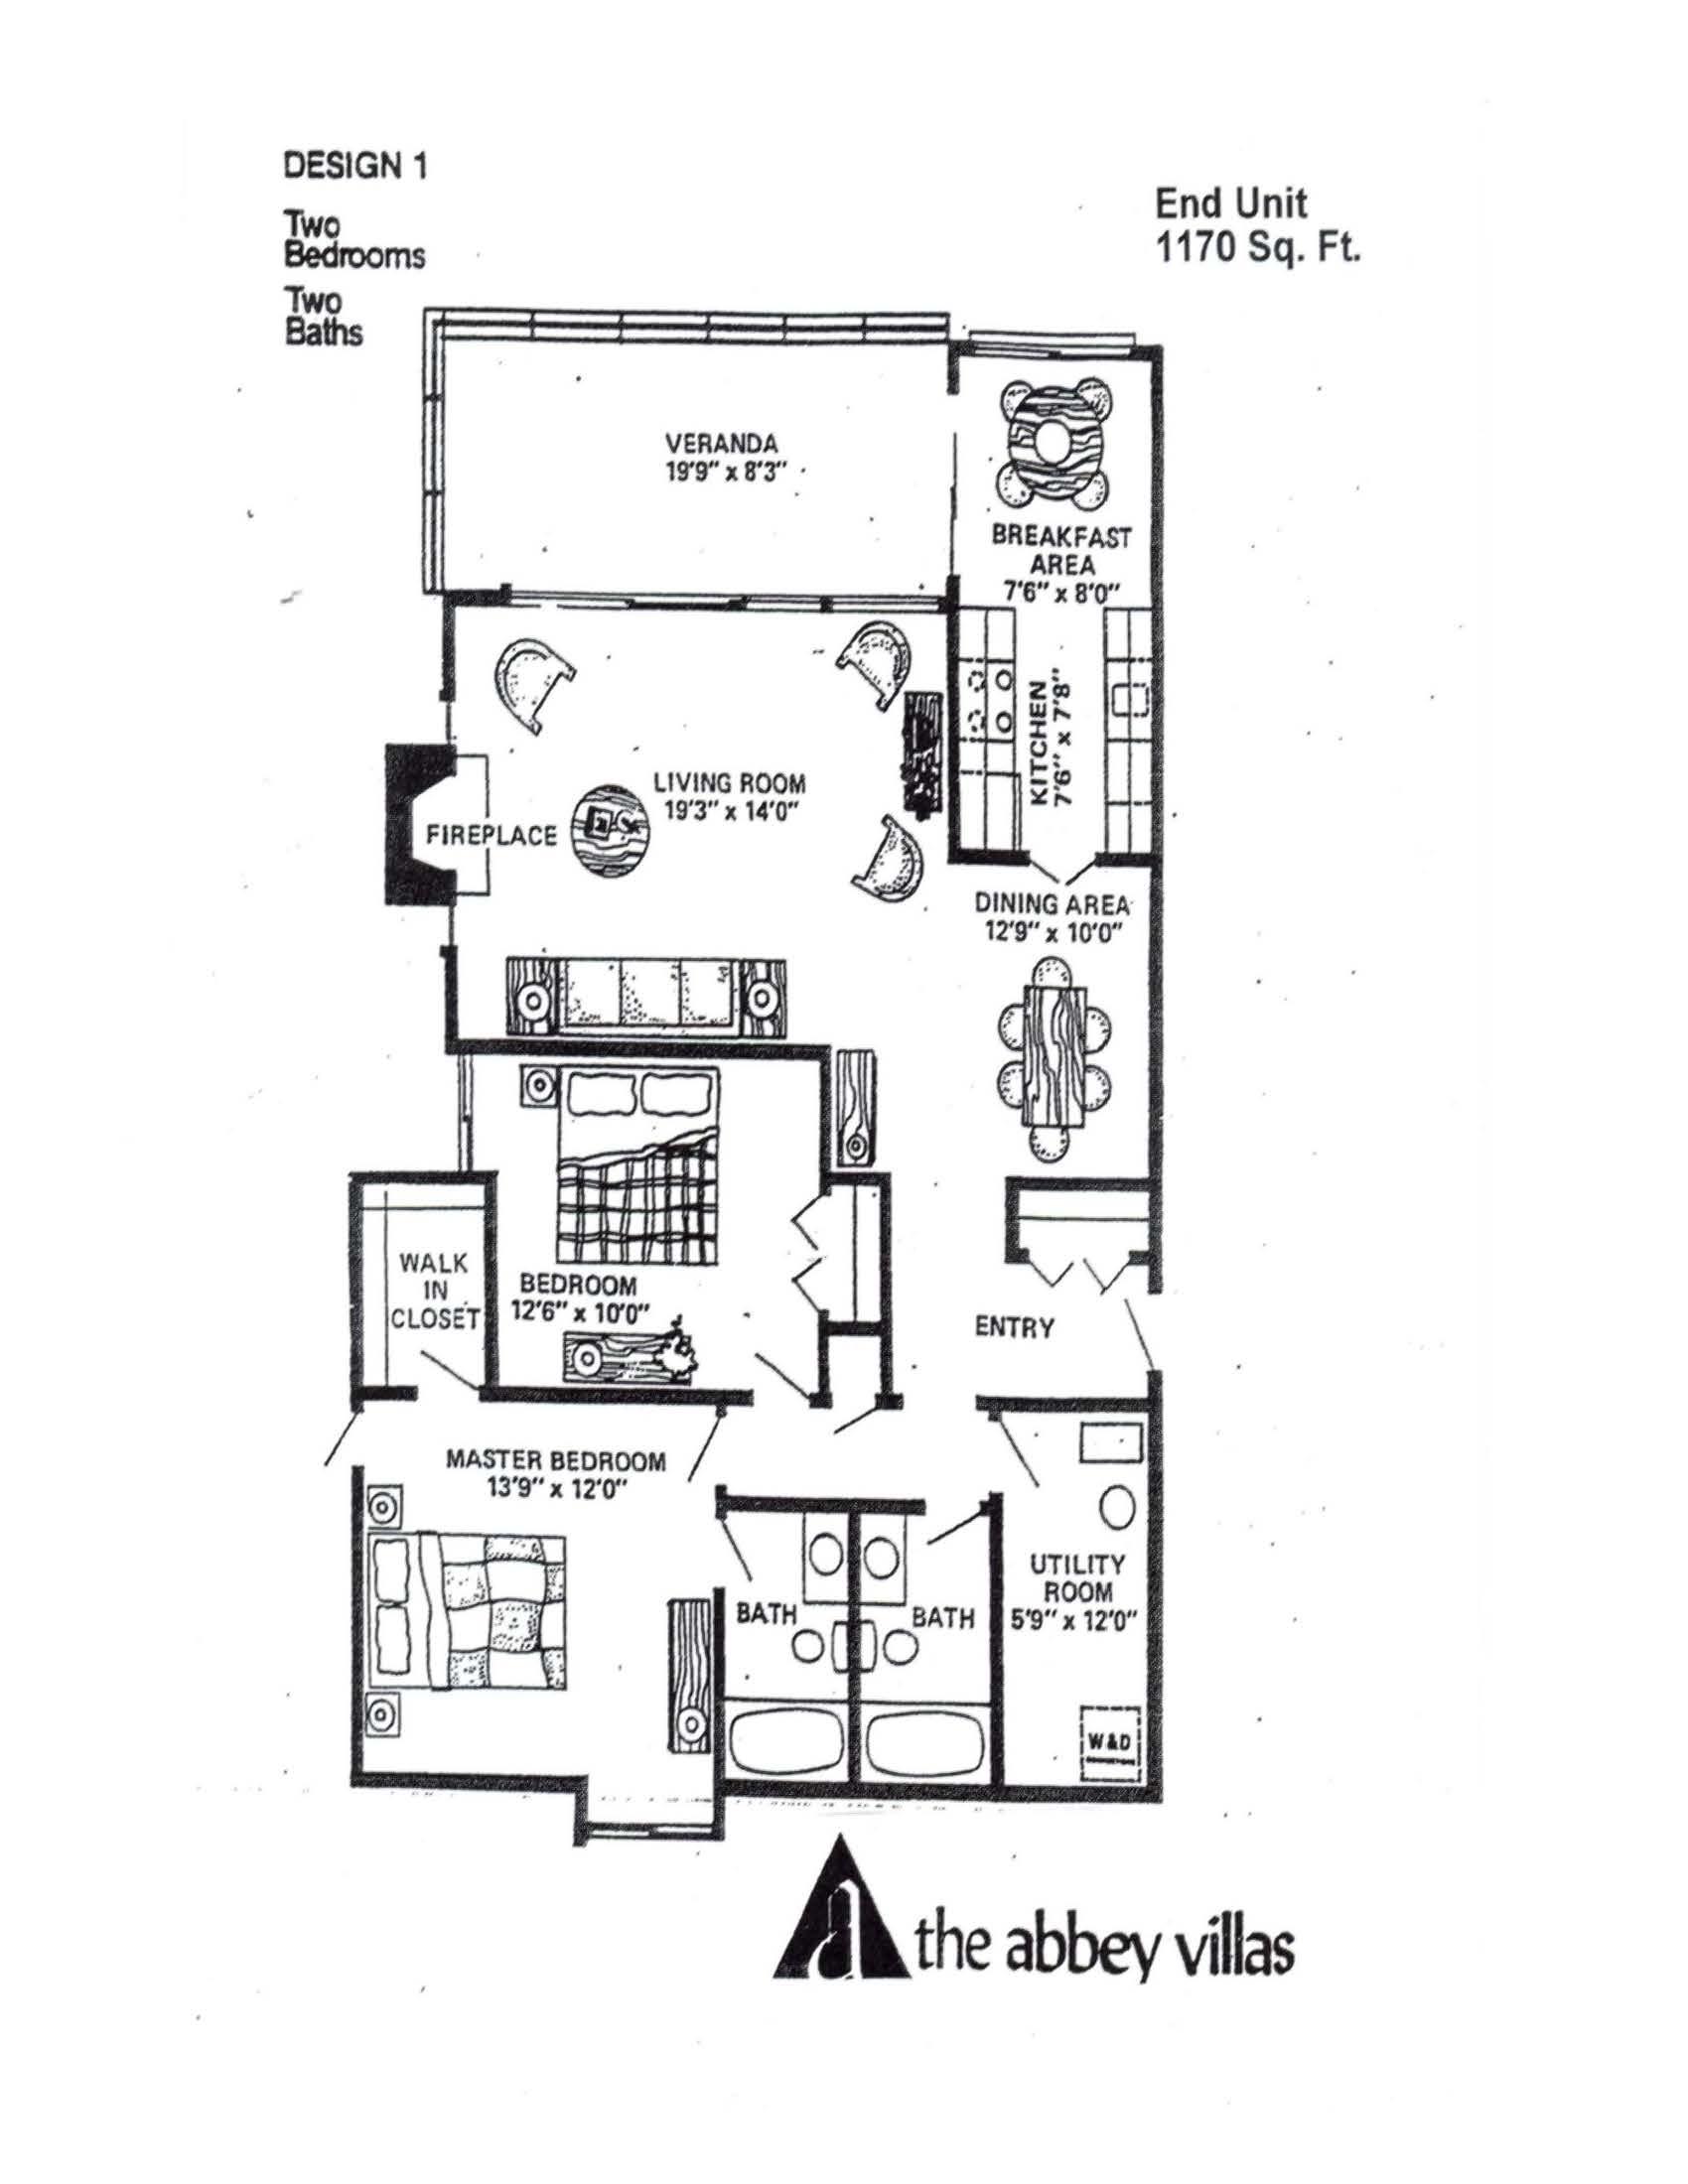 Abbey Villa Floor Plan 1.31.20.jpg